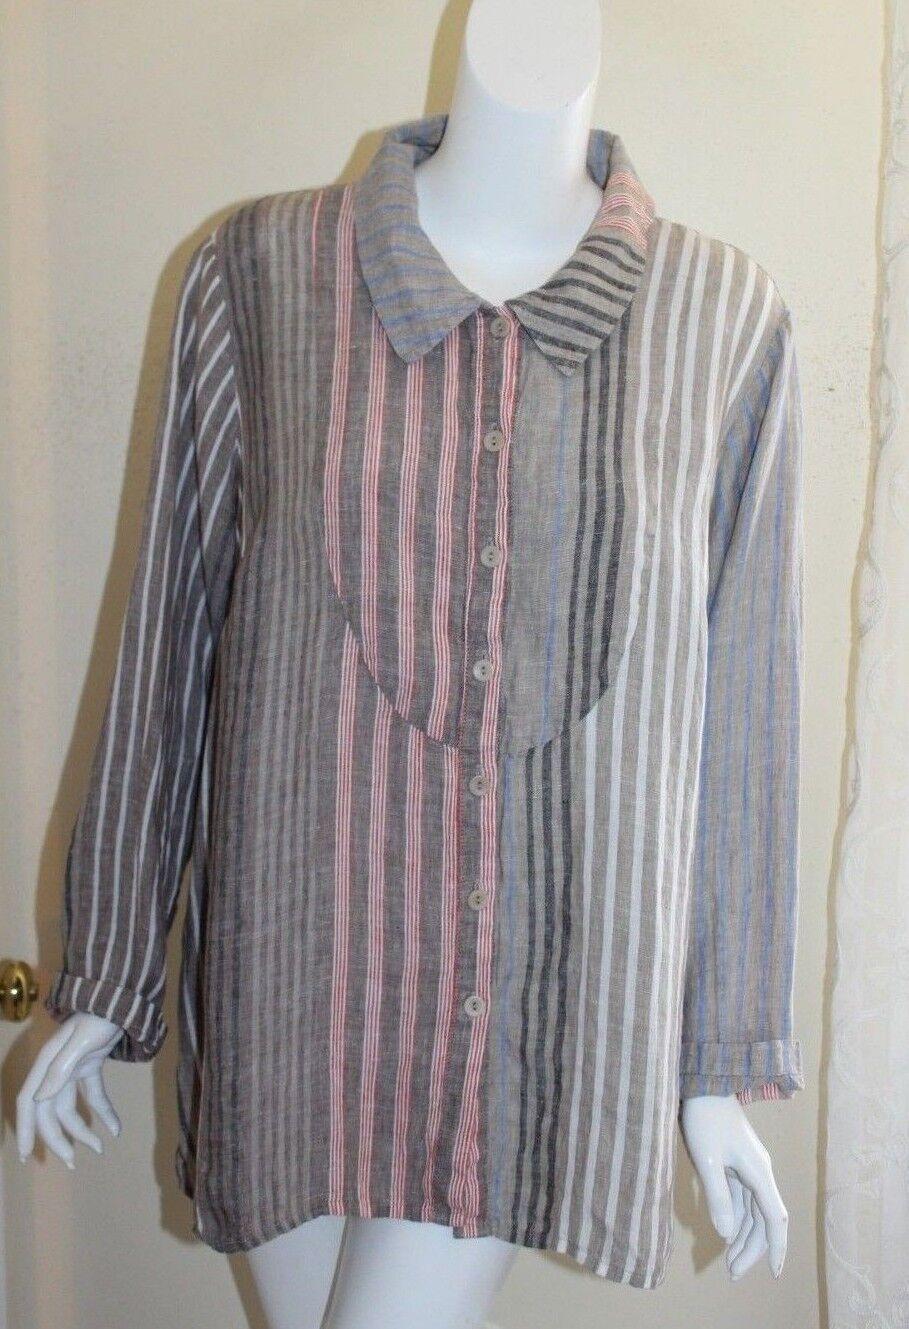 Flax Sz 1G 18 20 Multi Striped Yoked Lagen Peasant Linen Shirt Top Gather Back